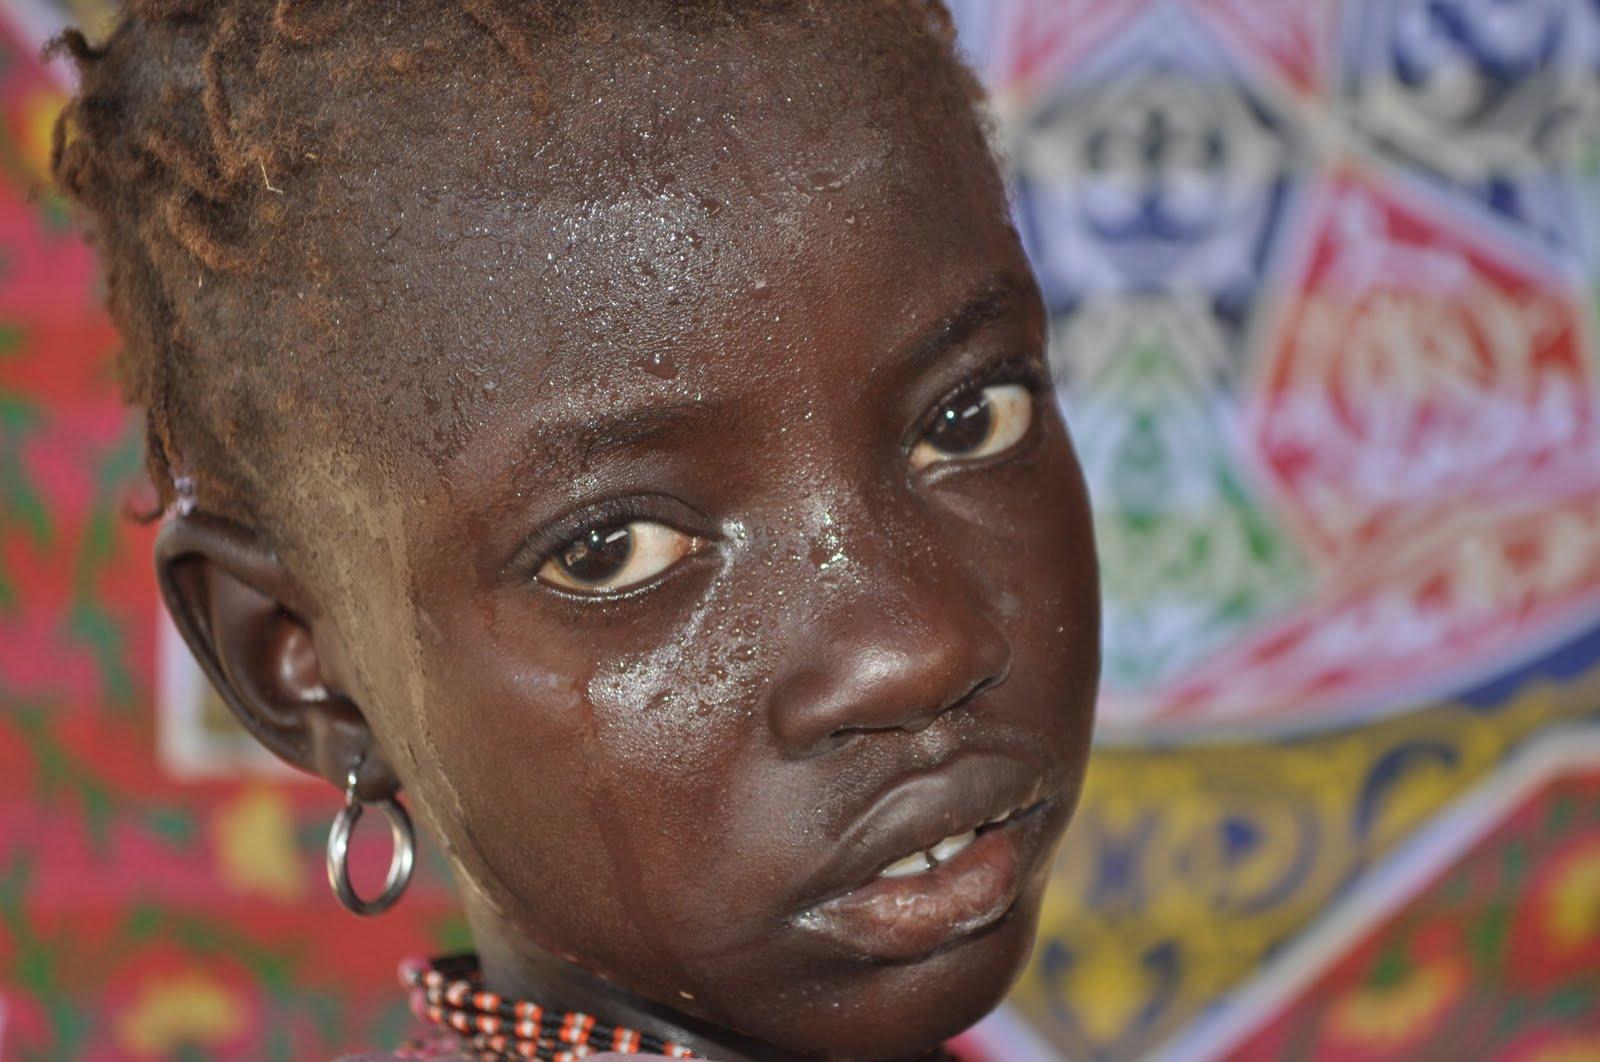 hiv africa: